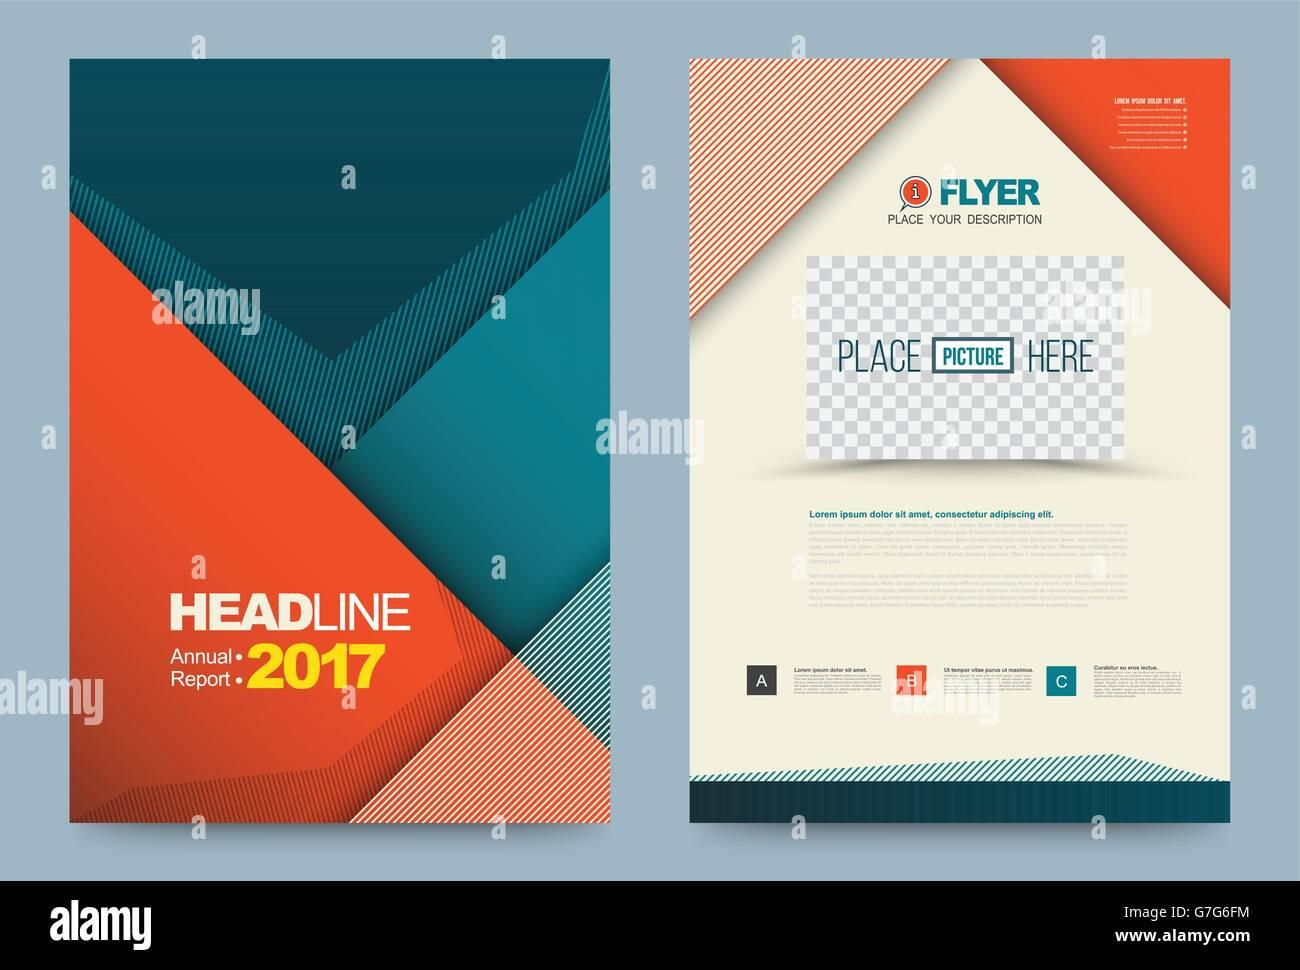 cover template design for business annual report flyer brochure, Template Presentation Brochure, Presentation templates